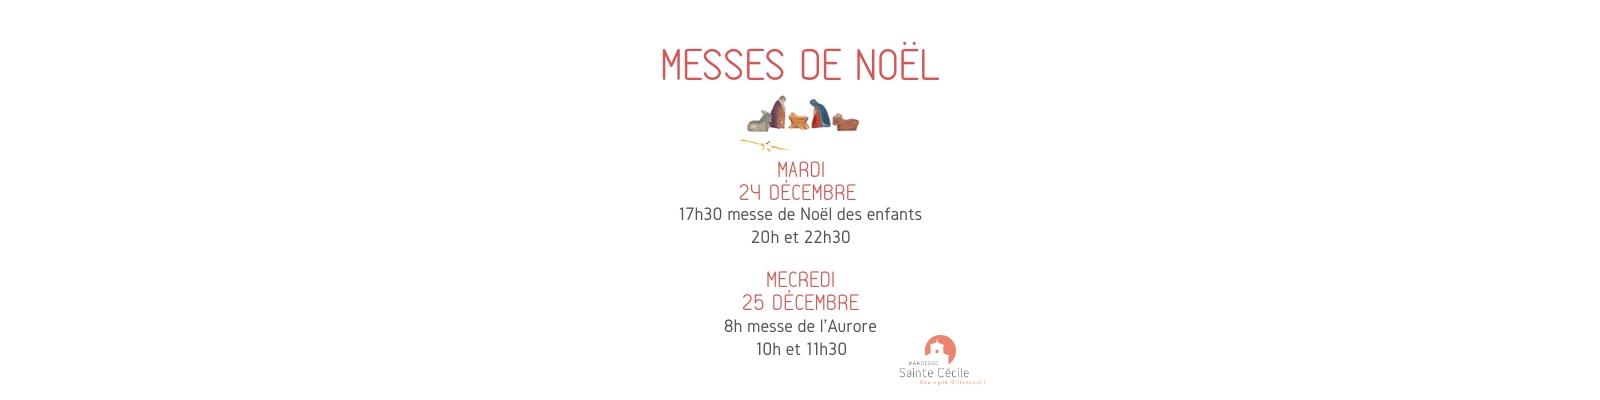 Header-site-Messe-de-Noël-2019